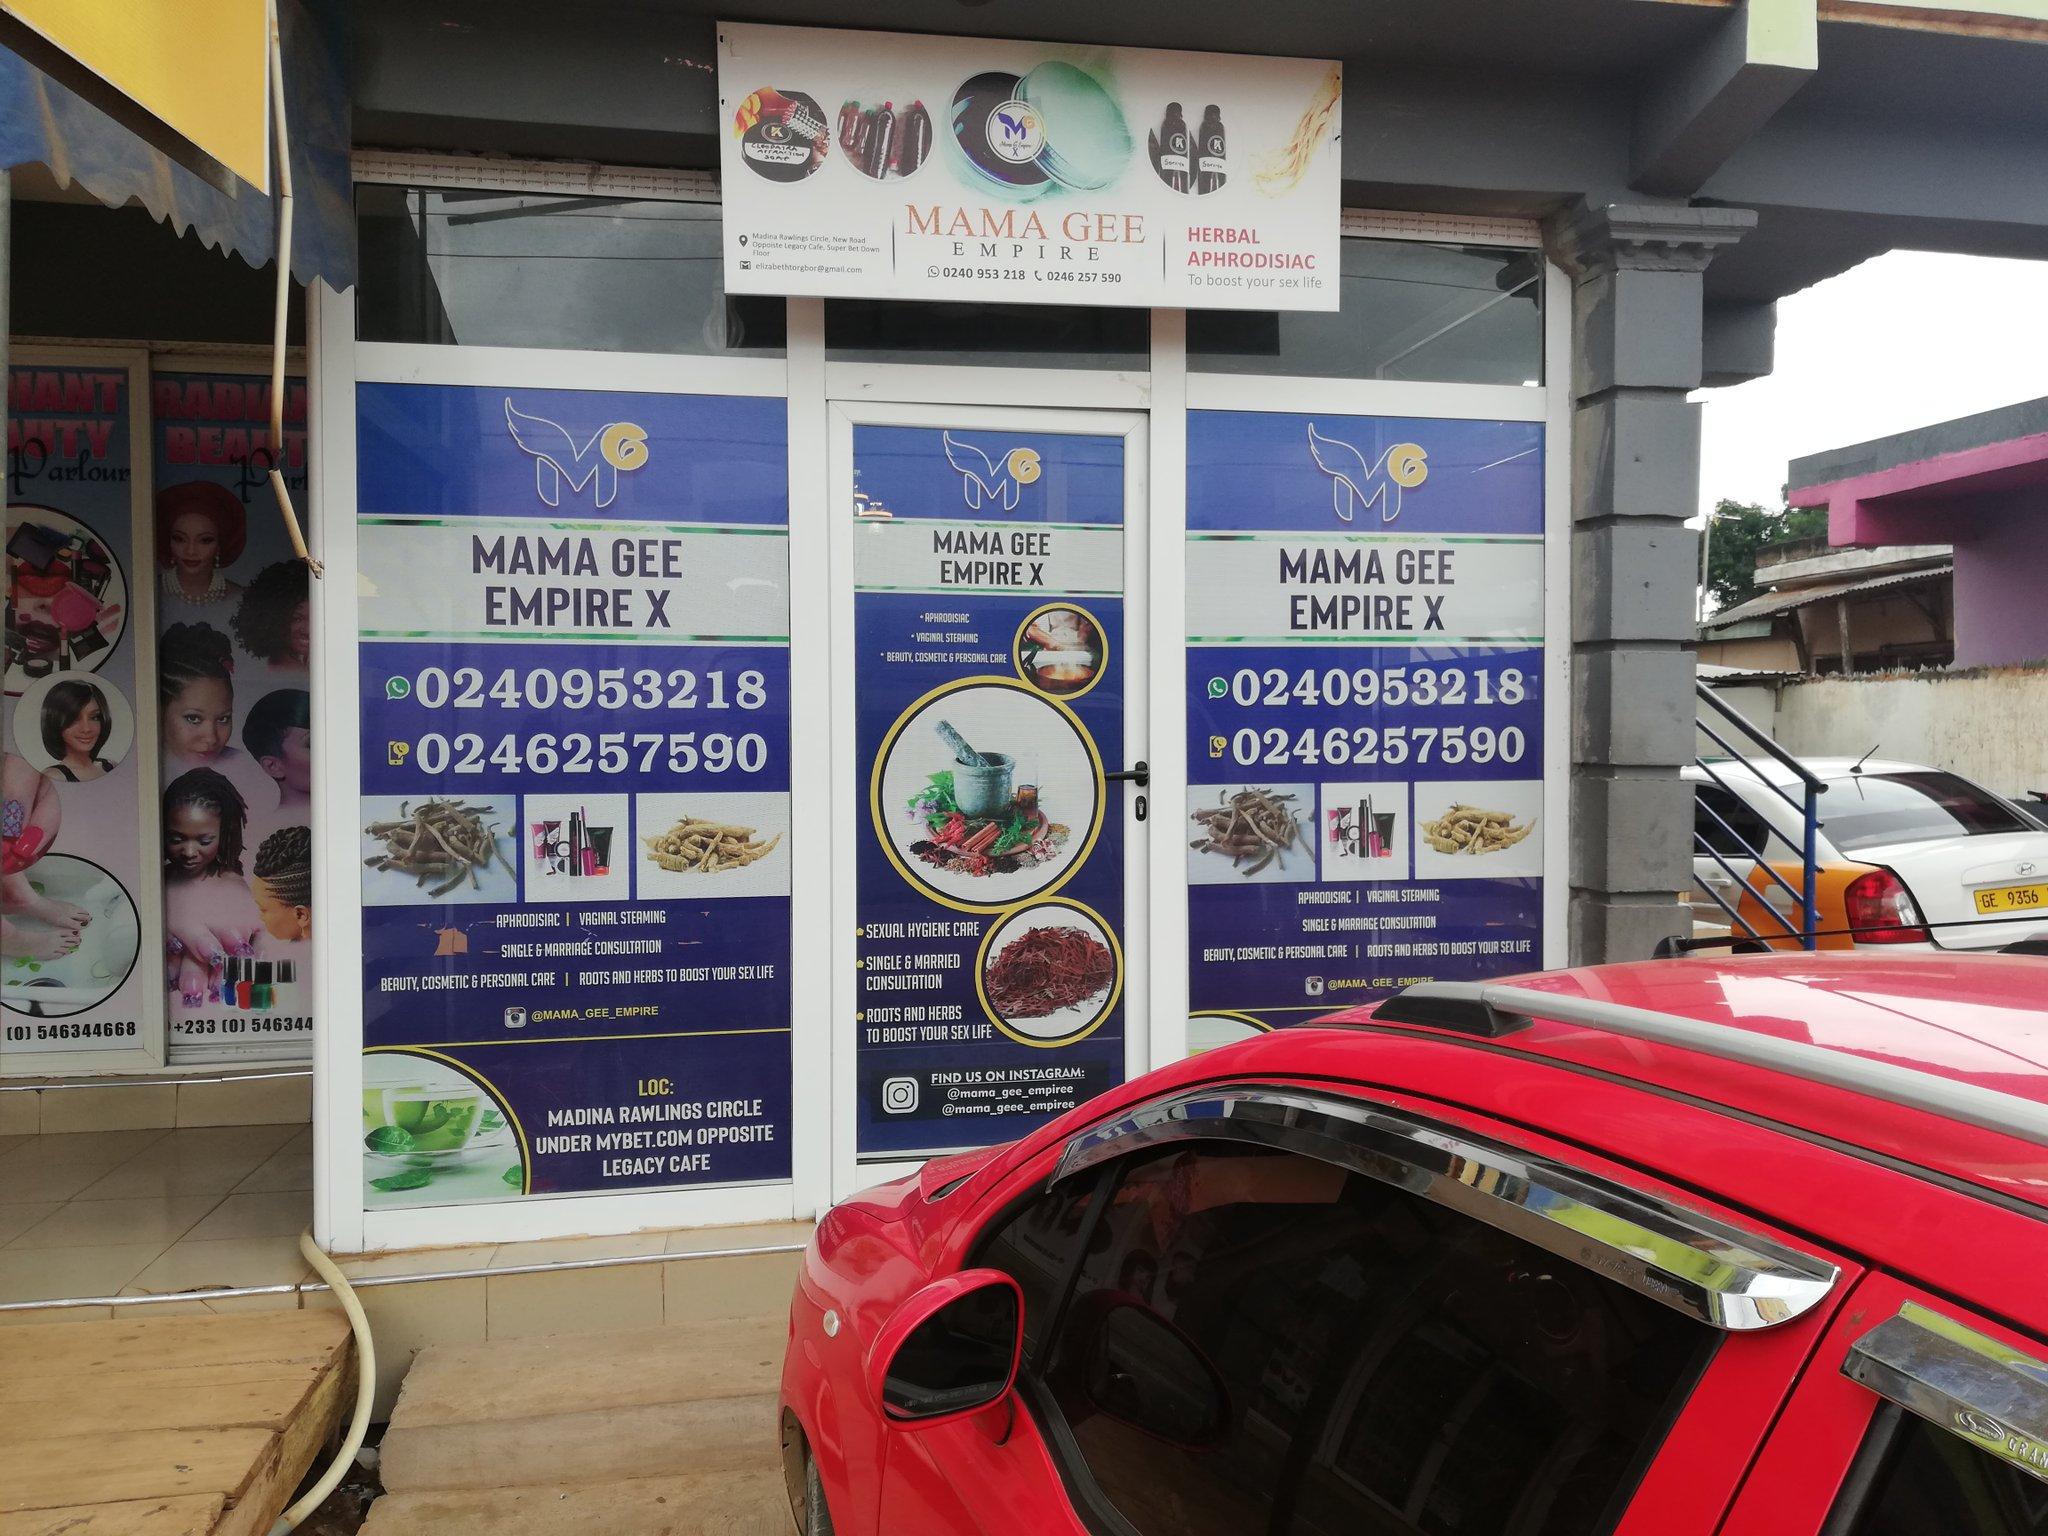 Mama Gee shop in Ghana